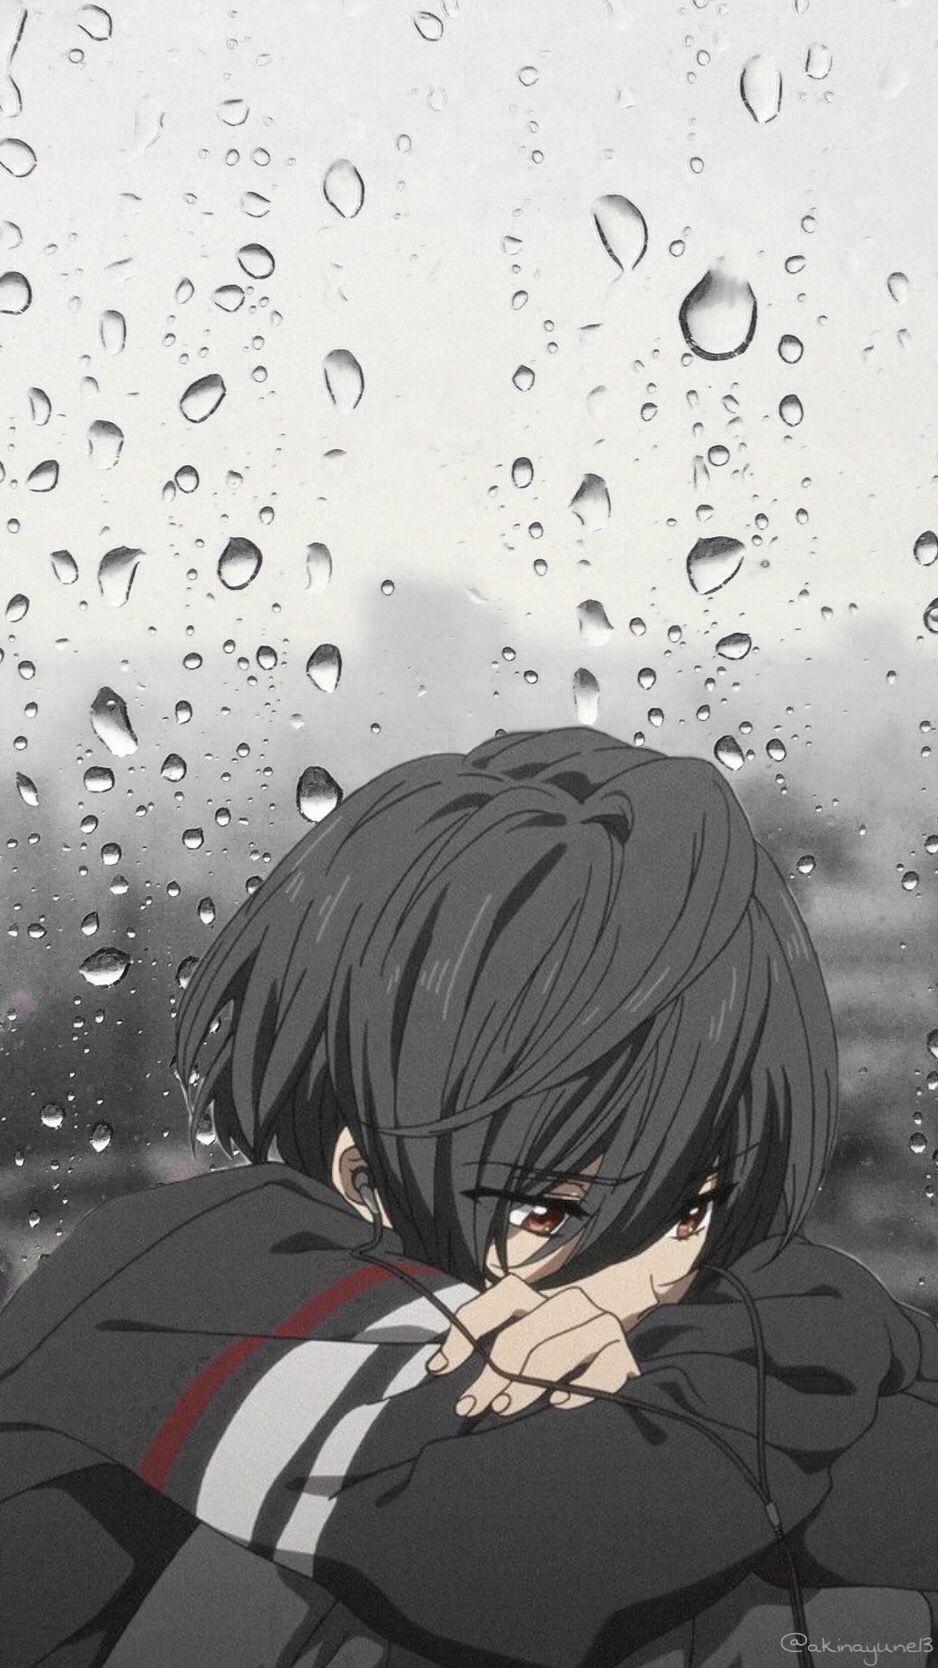 Sad Boy Anime Phone Wallpapers Wallpaper Cave